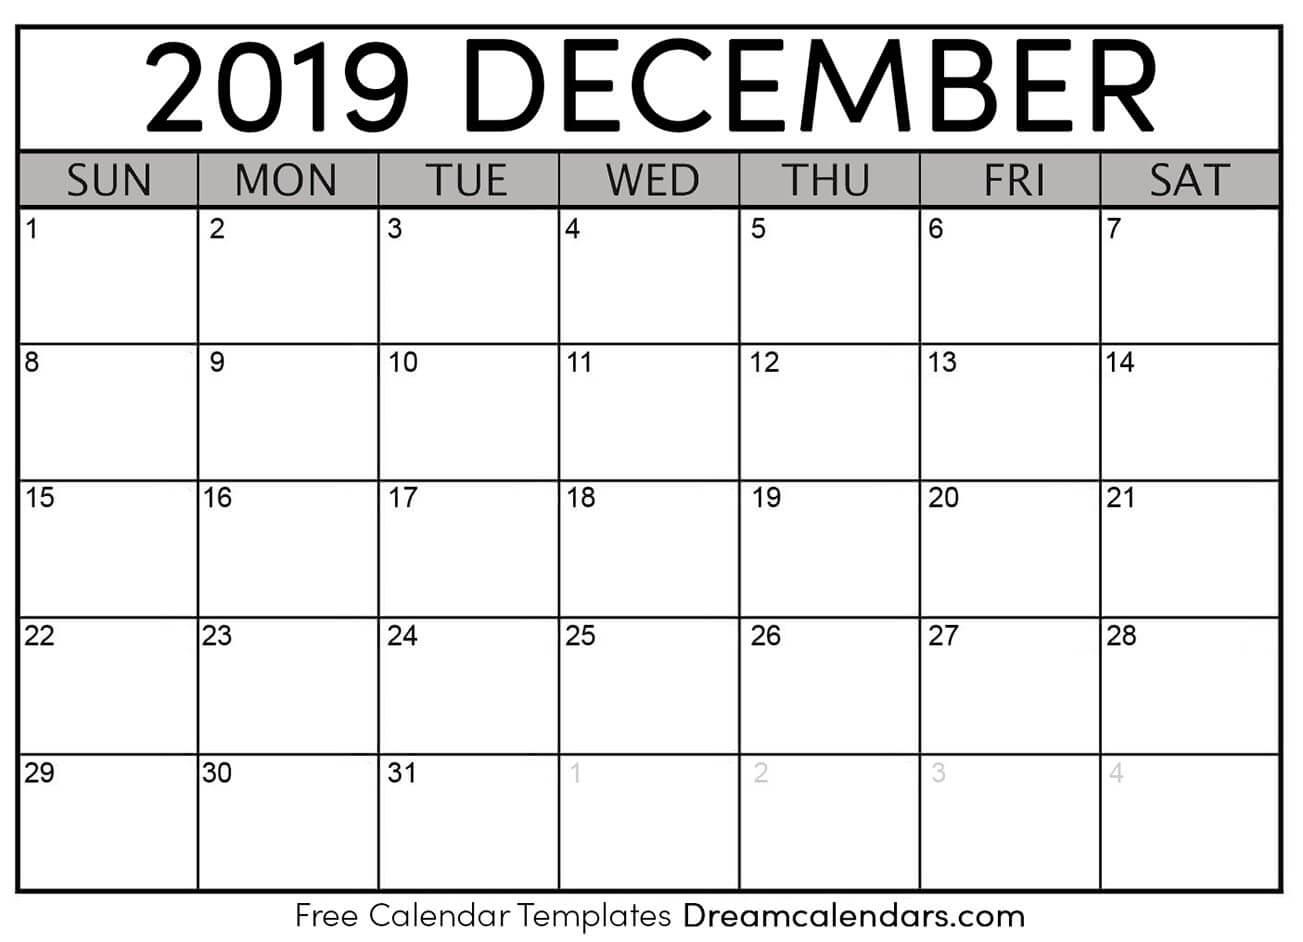 Free December 2019 Printable Calendar | Dream Calendars